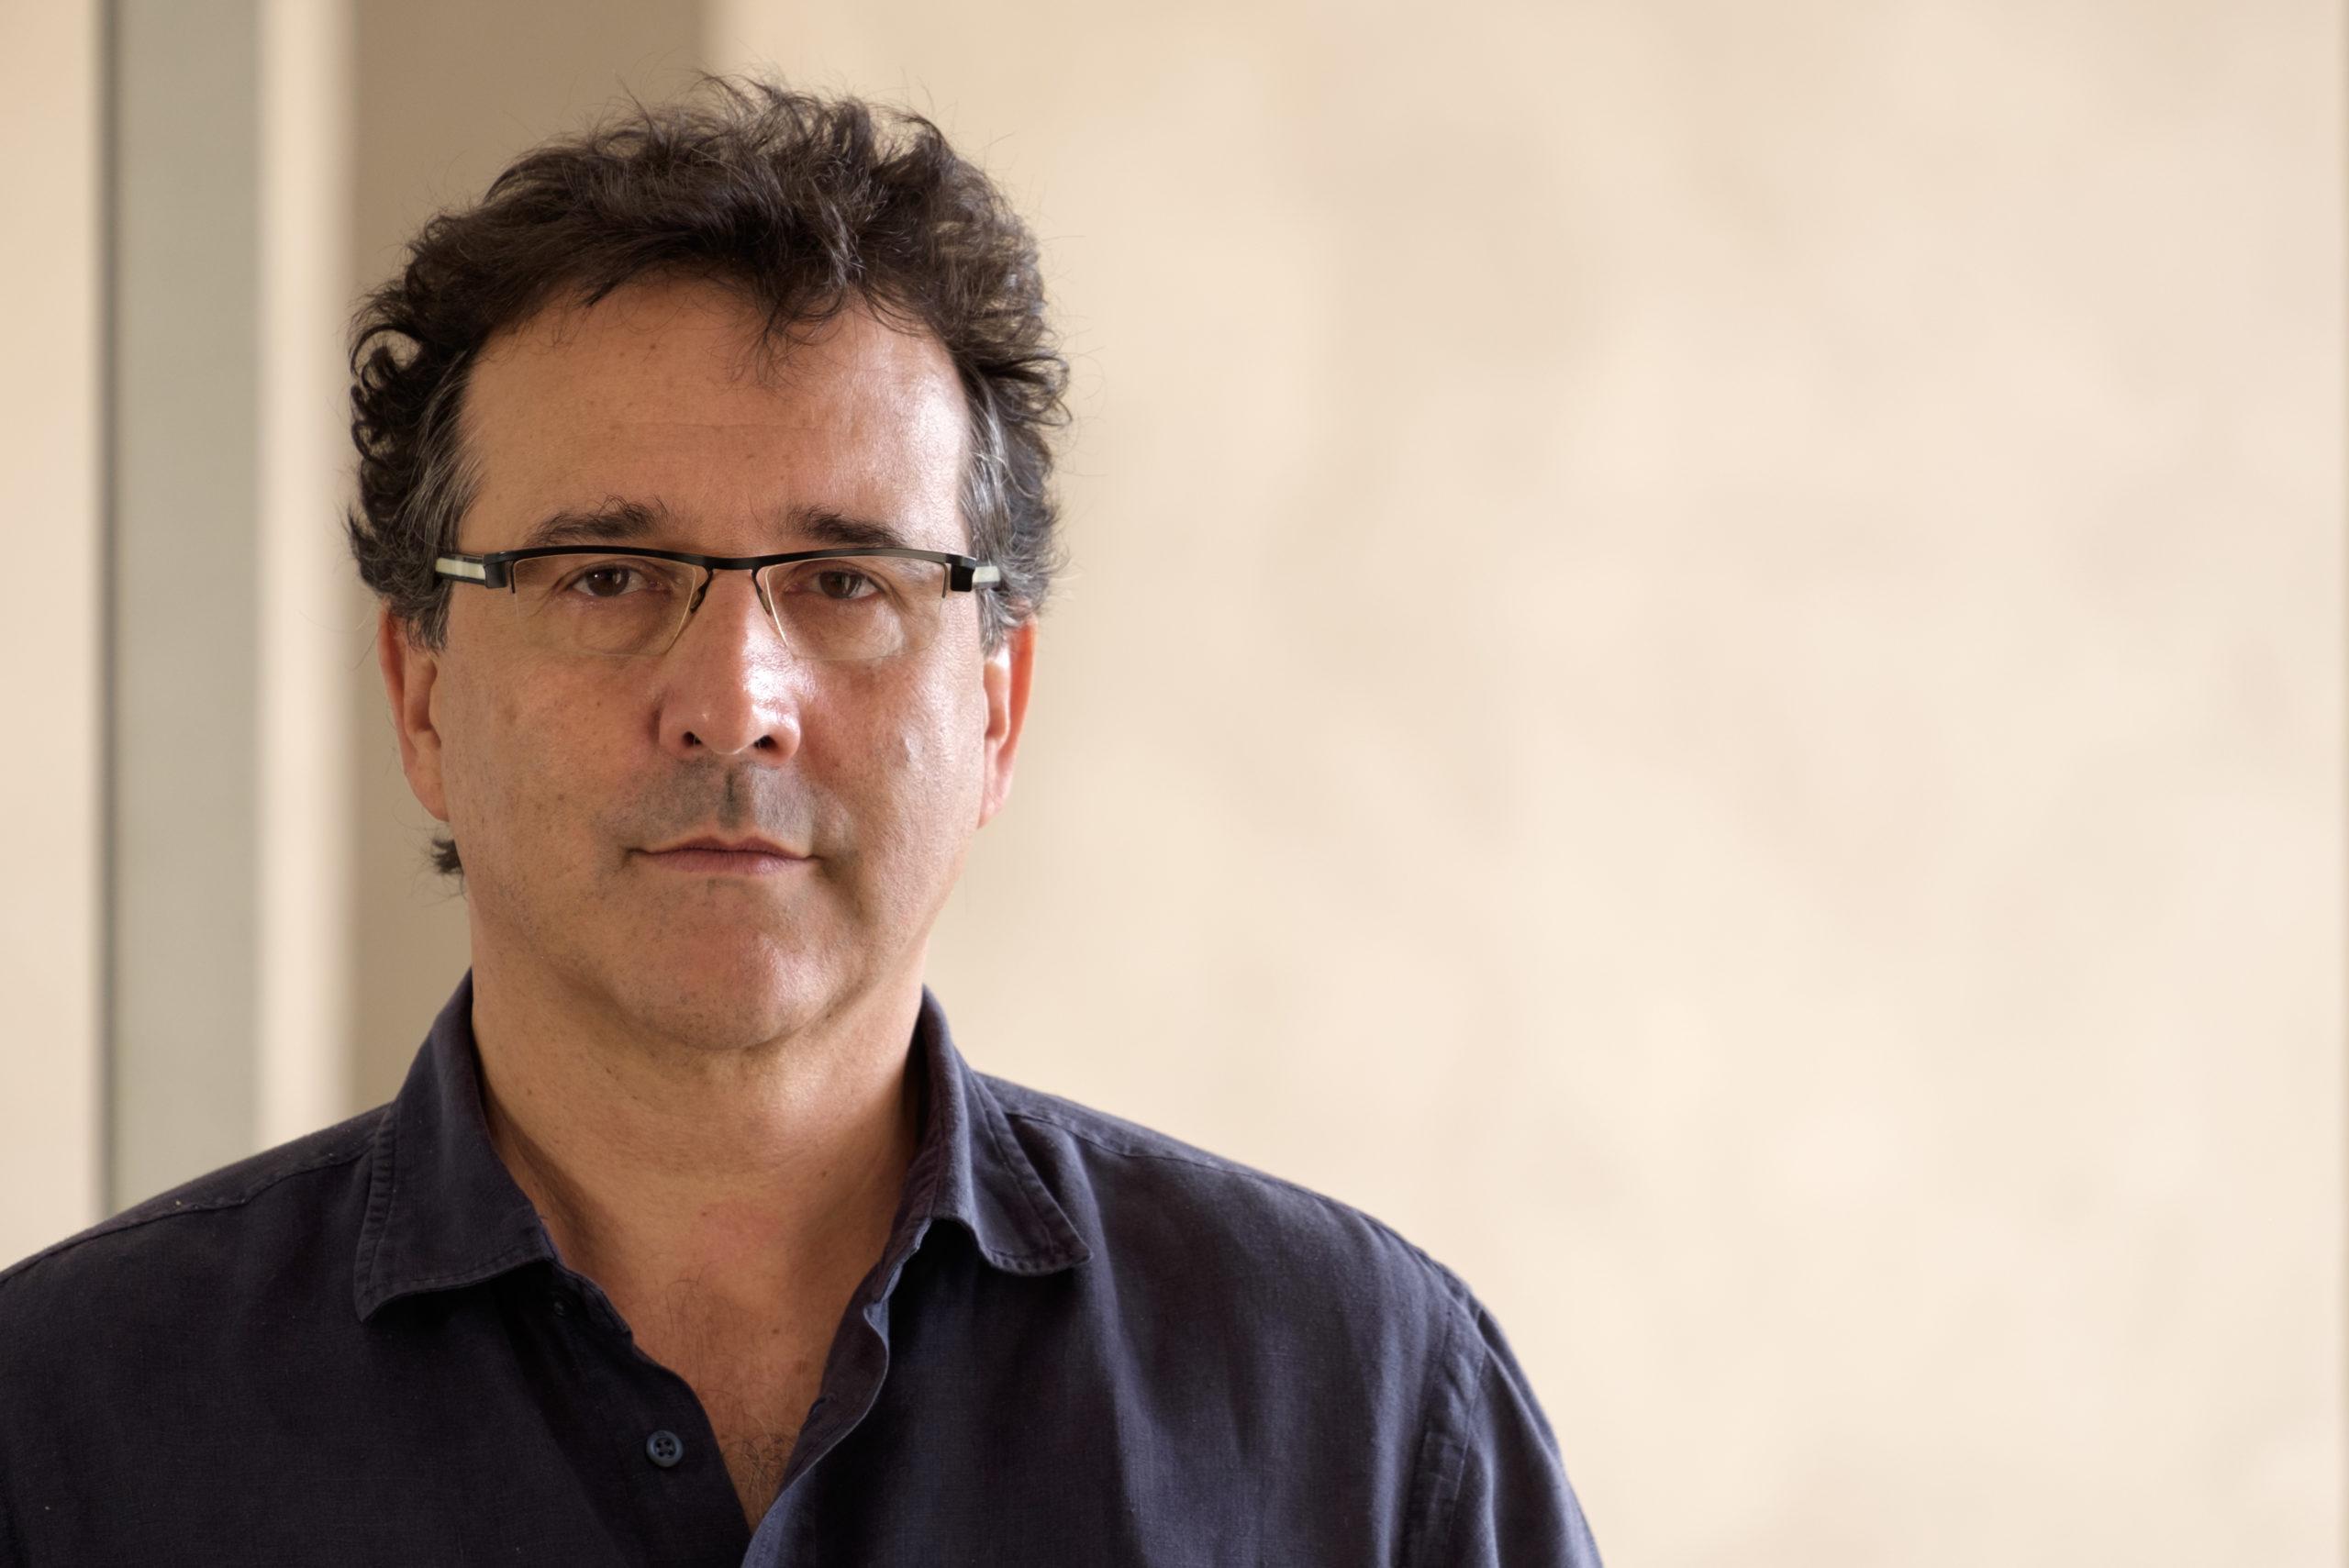 Mauro Munhoz © Walter Craveiro